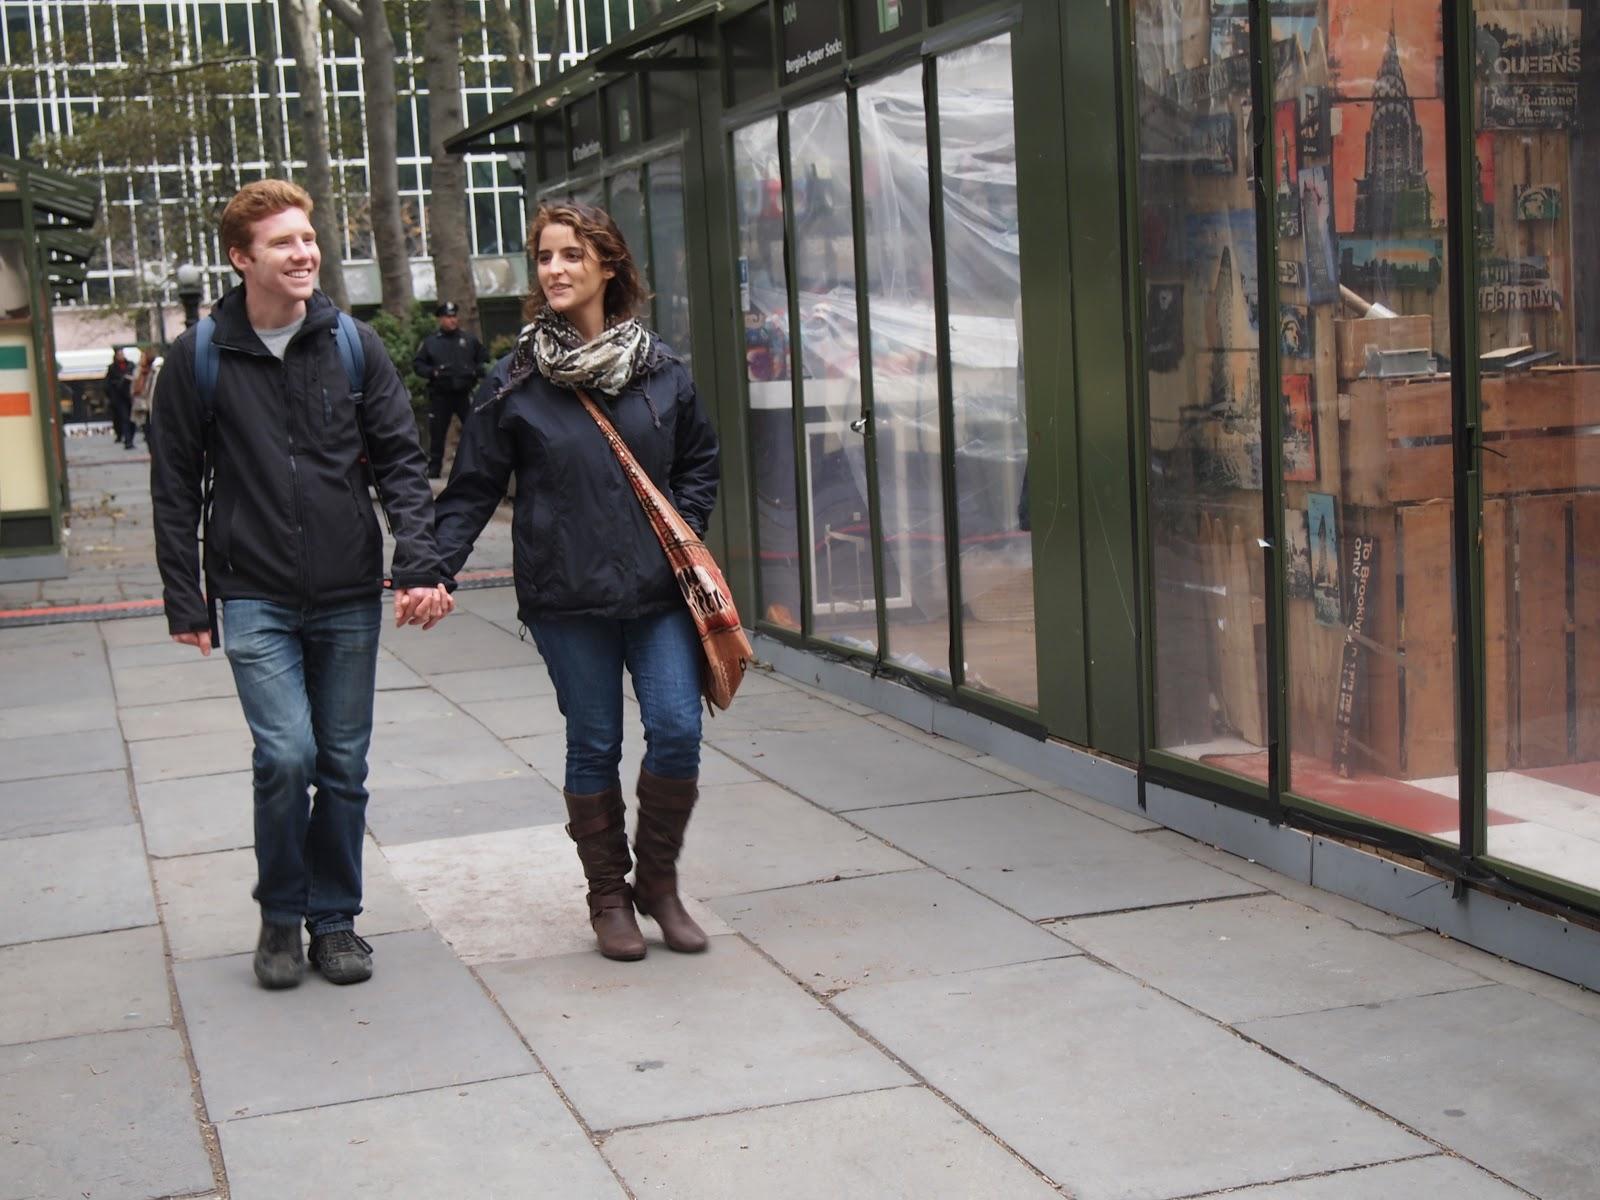 http://1.bp.blogspot.com/-rd-s1NydXyk/UJLHrTNvhCI/AAAAAAAABpE/3XohUj0Ymj0/s1600/couple+walking.jpeg